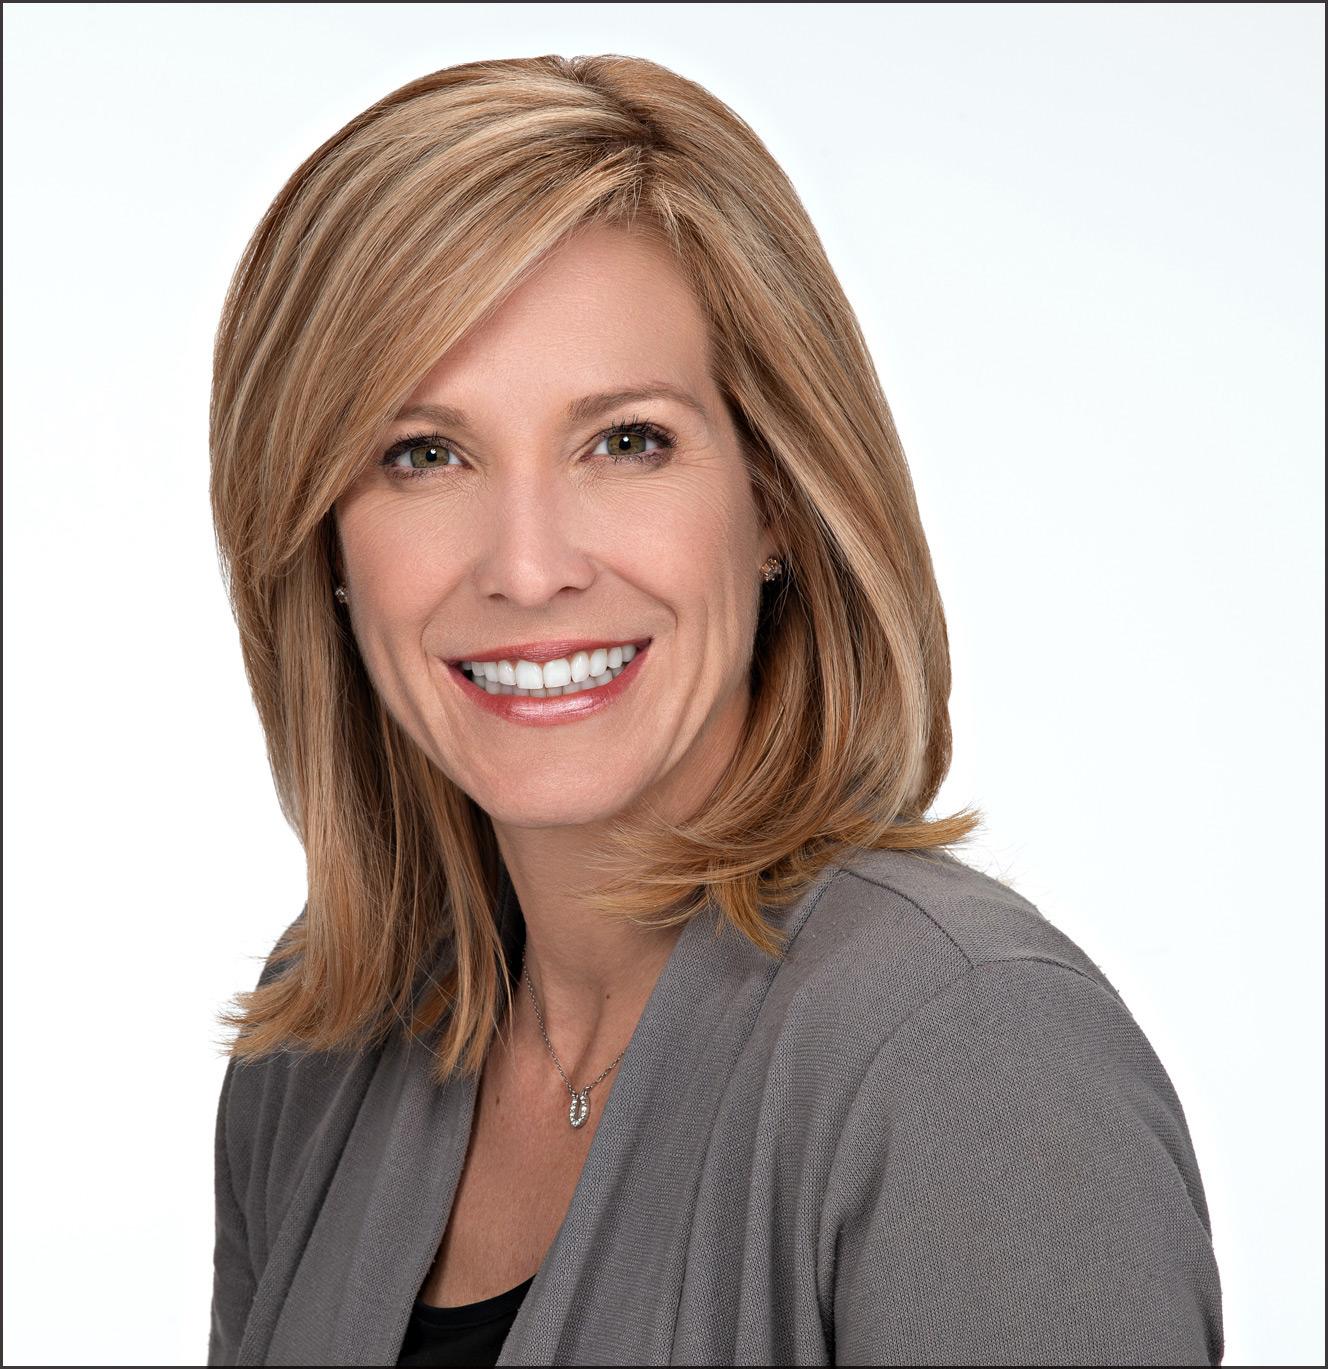 professional headshot of businesswoman